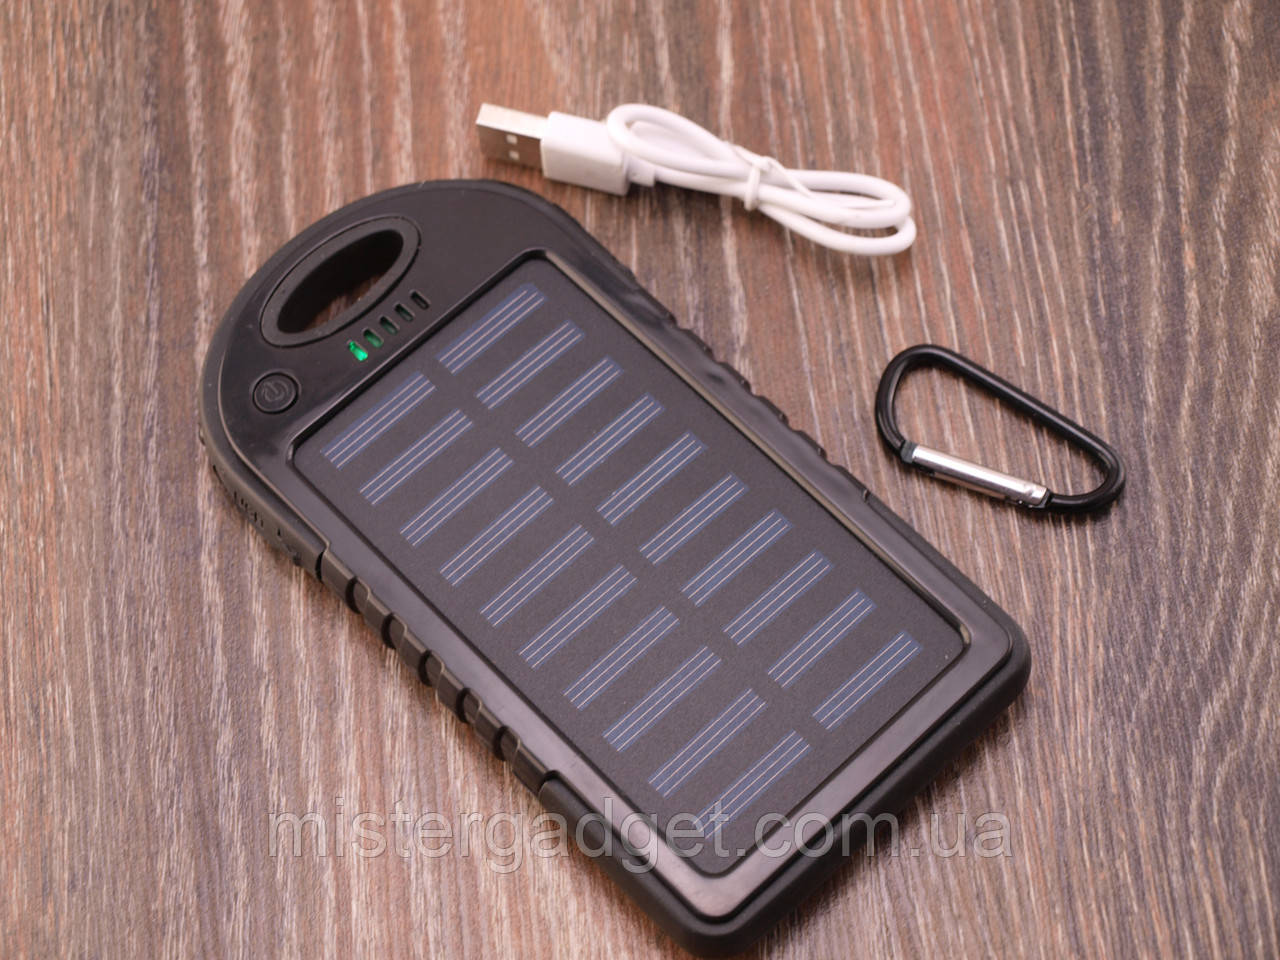 Солнечная батарея Solar PowerBank 20000mah Павербанк